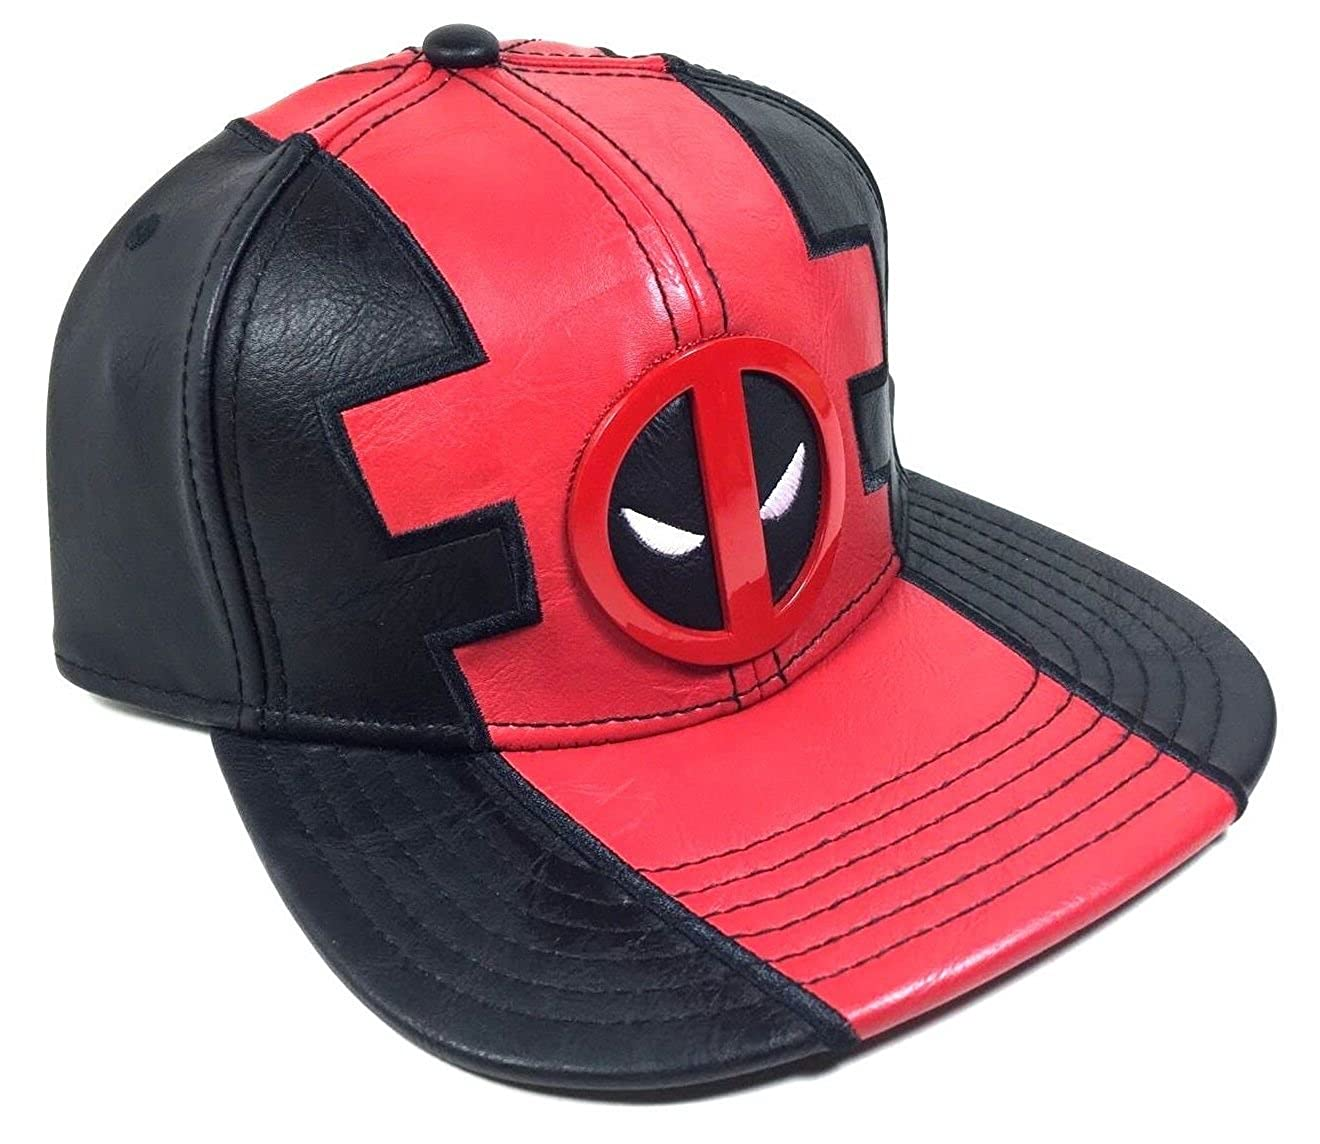 45b41c1640a1e Amazon.com  Marvel Comics Deadpool Suit Up Pu Faux Leather Snapback   Clothing